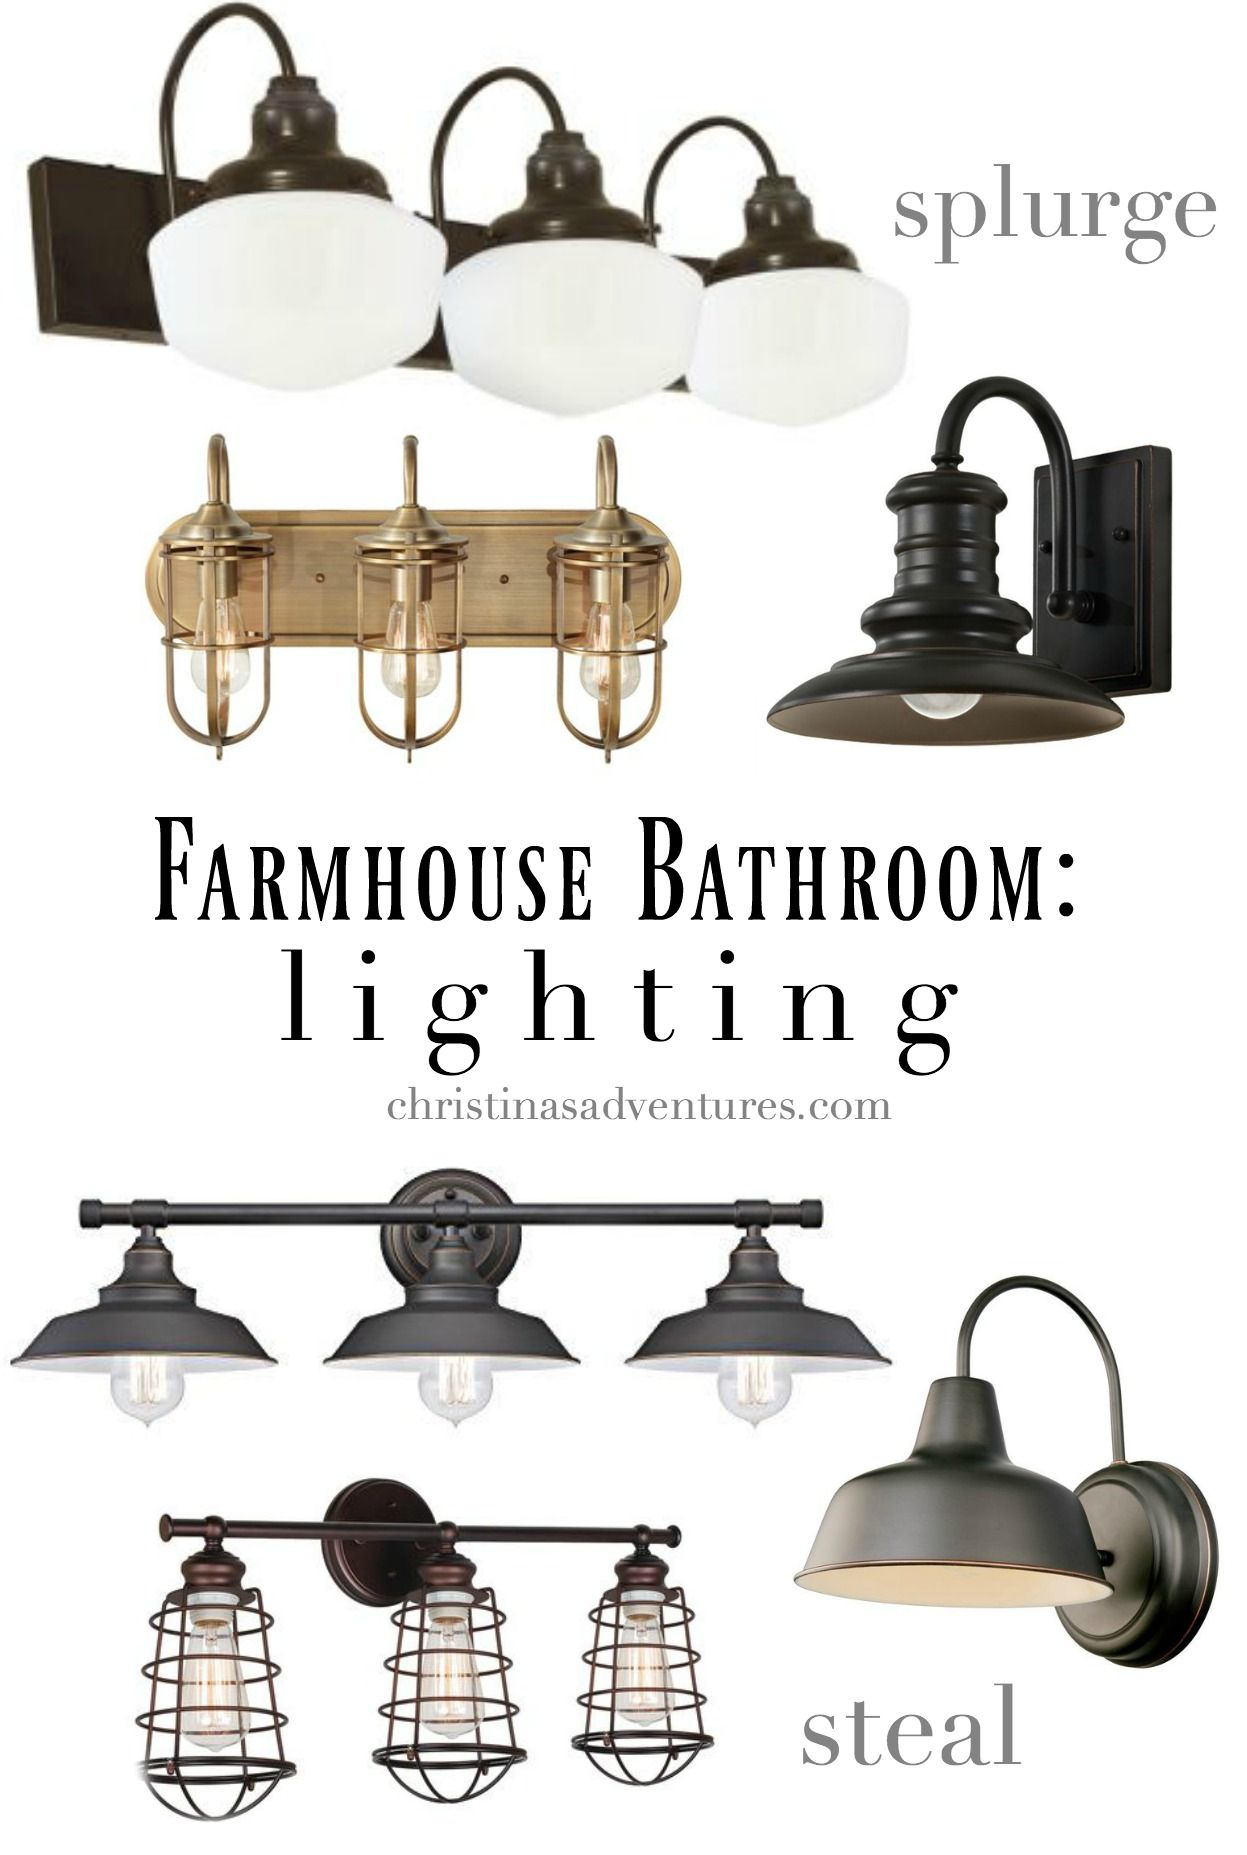 Farmhouse Bathroom Design Big Bathrooms Bathroom Designs And - Farmhouse bathroom light fixtures for bathroom decor ideas